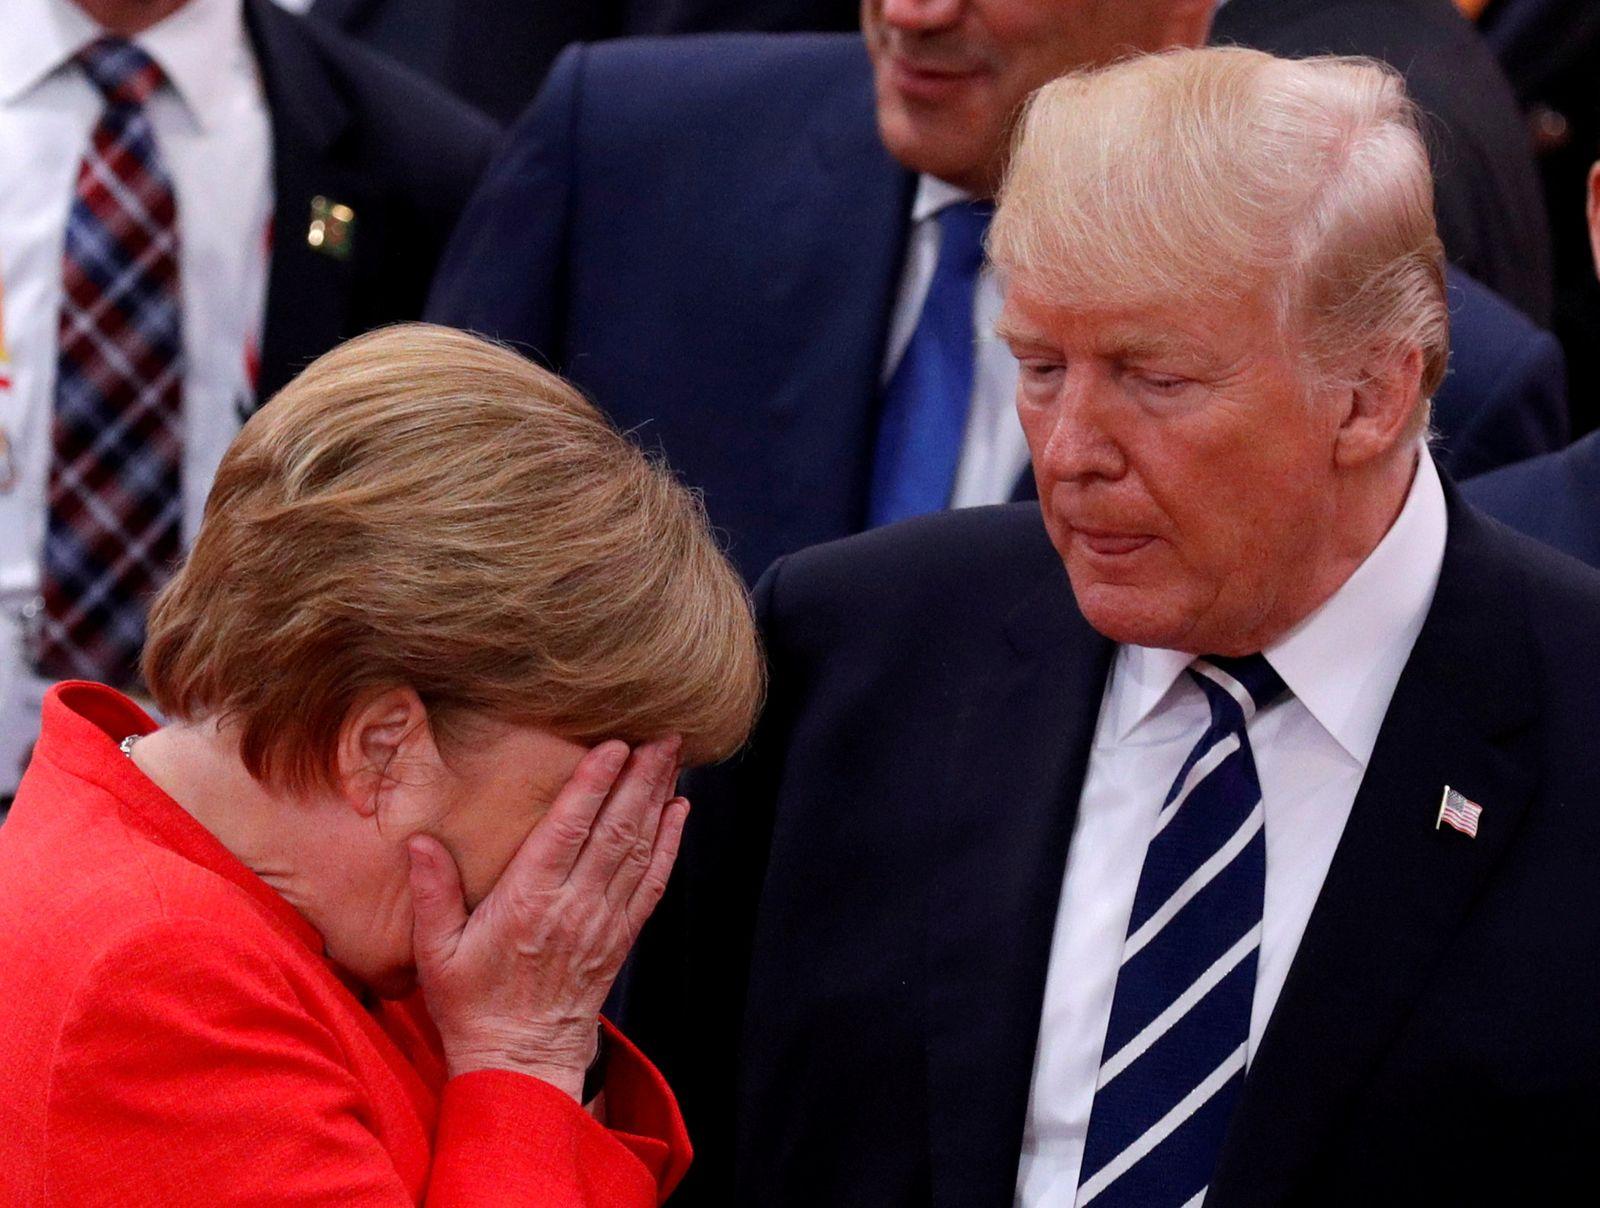 FILE PHOTO: G20 leaders summit in Hamburg